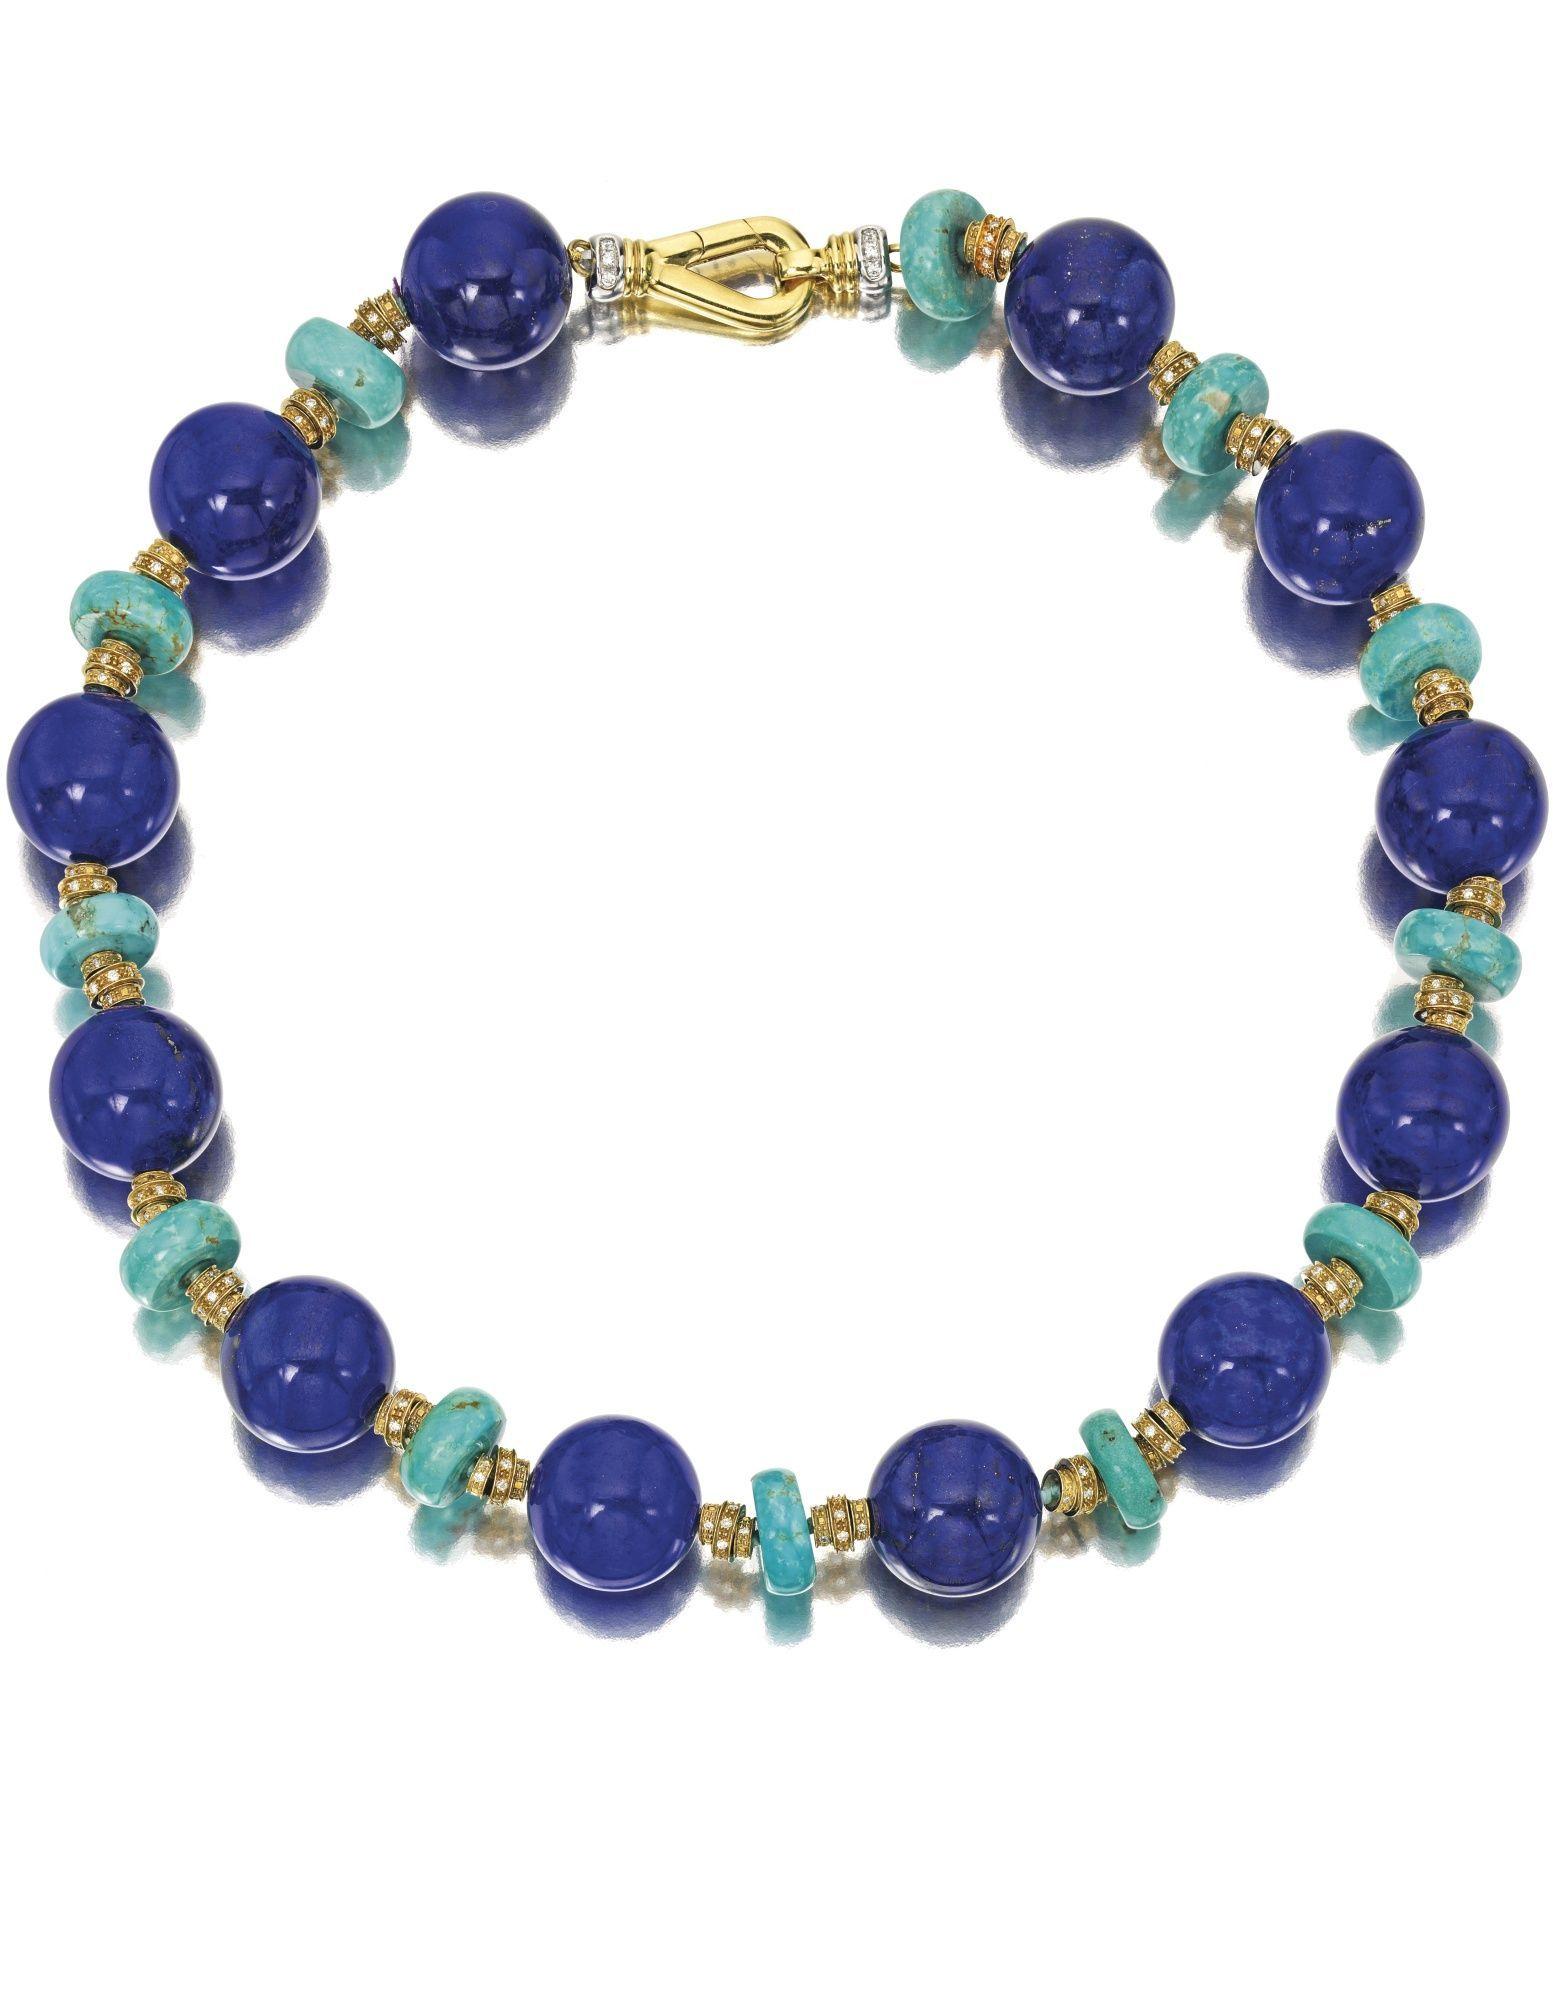 c74e005898a8 ... Perlas De Agua Dulce · Colgante De Diamante · Joyas Con Cuentas · 18  Karat Gold